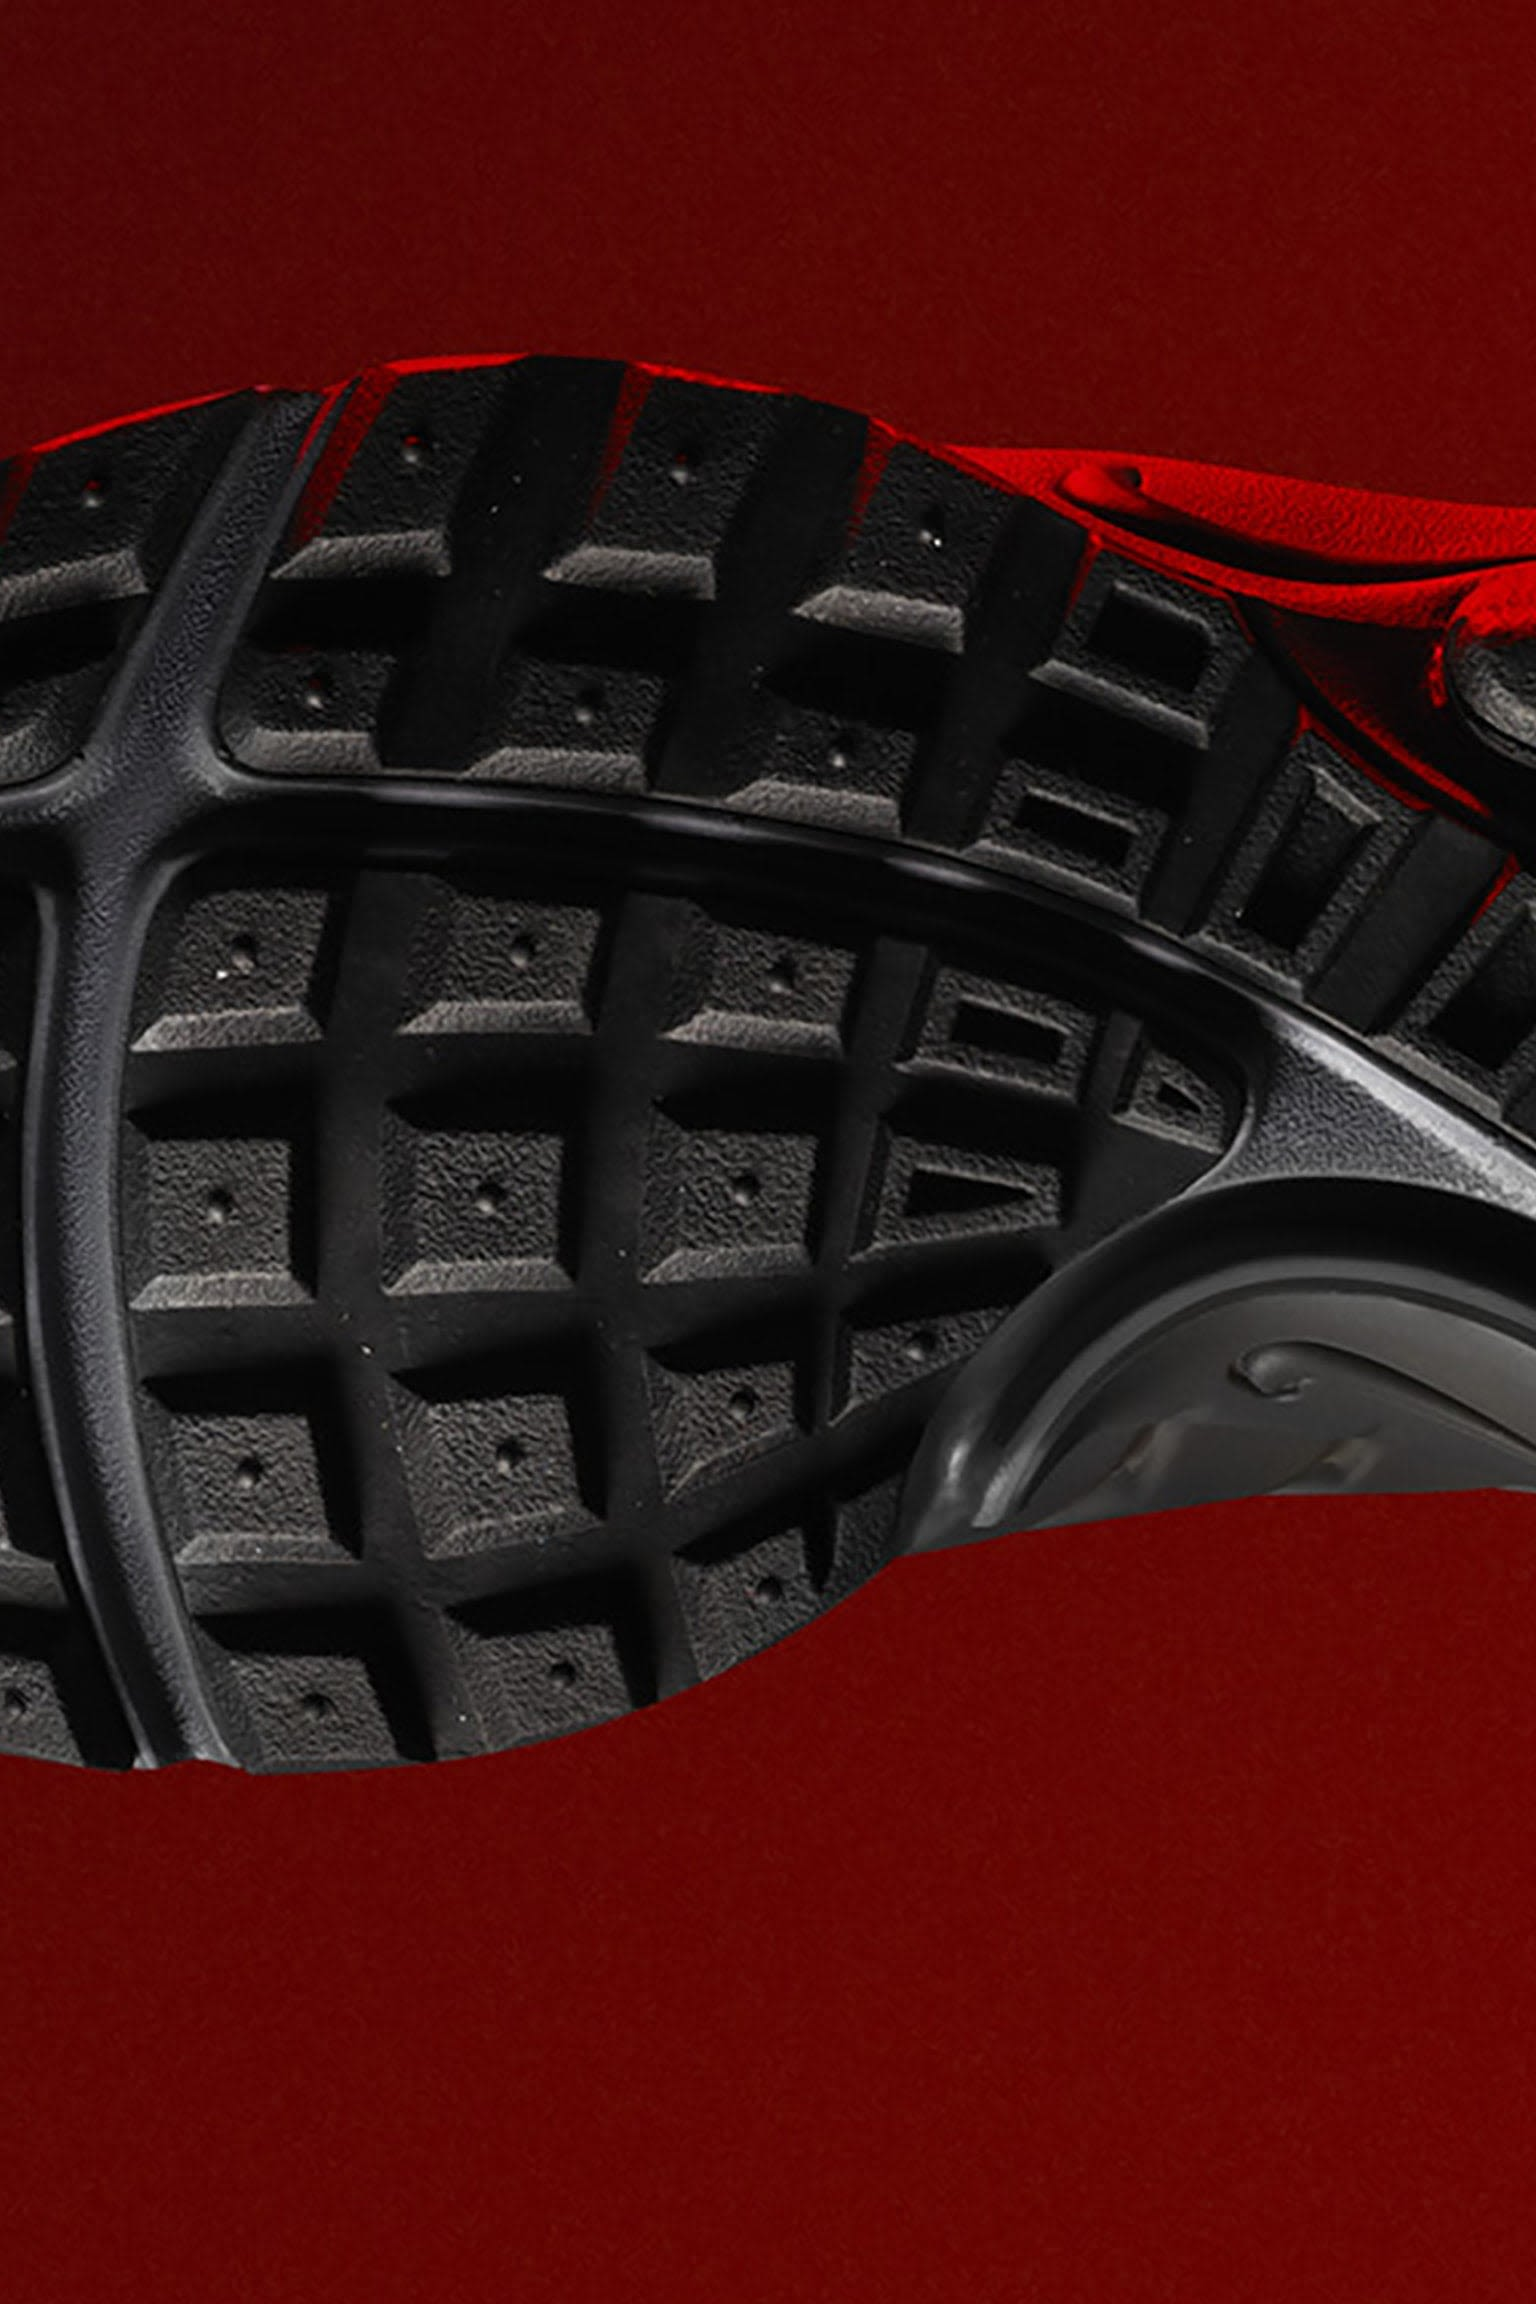 Nike Air Presto Mid Utility SneakerBoot « Black & Reflect Silver » pour Femme. Date de sortie